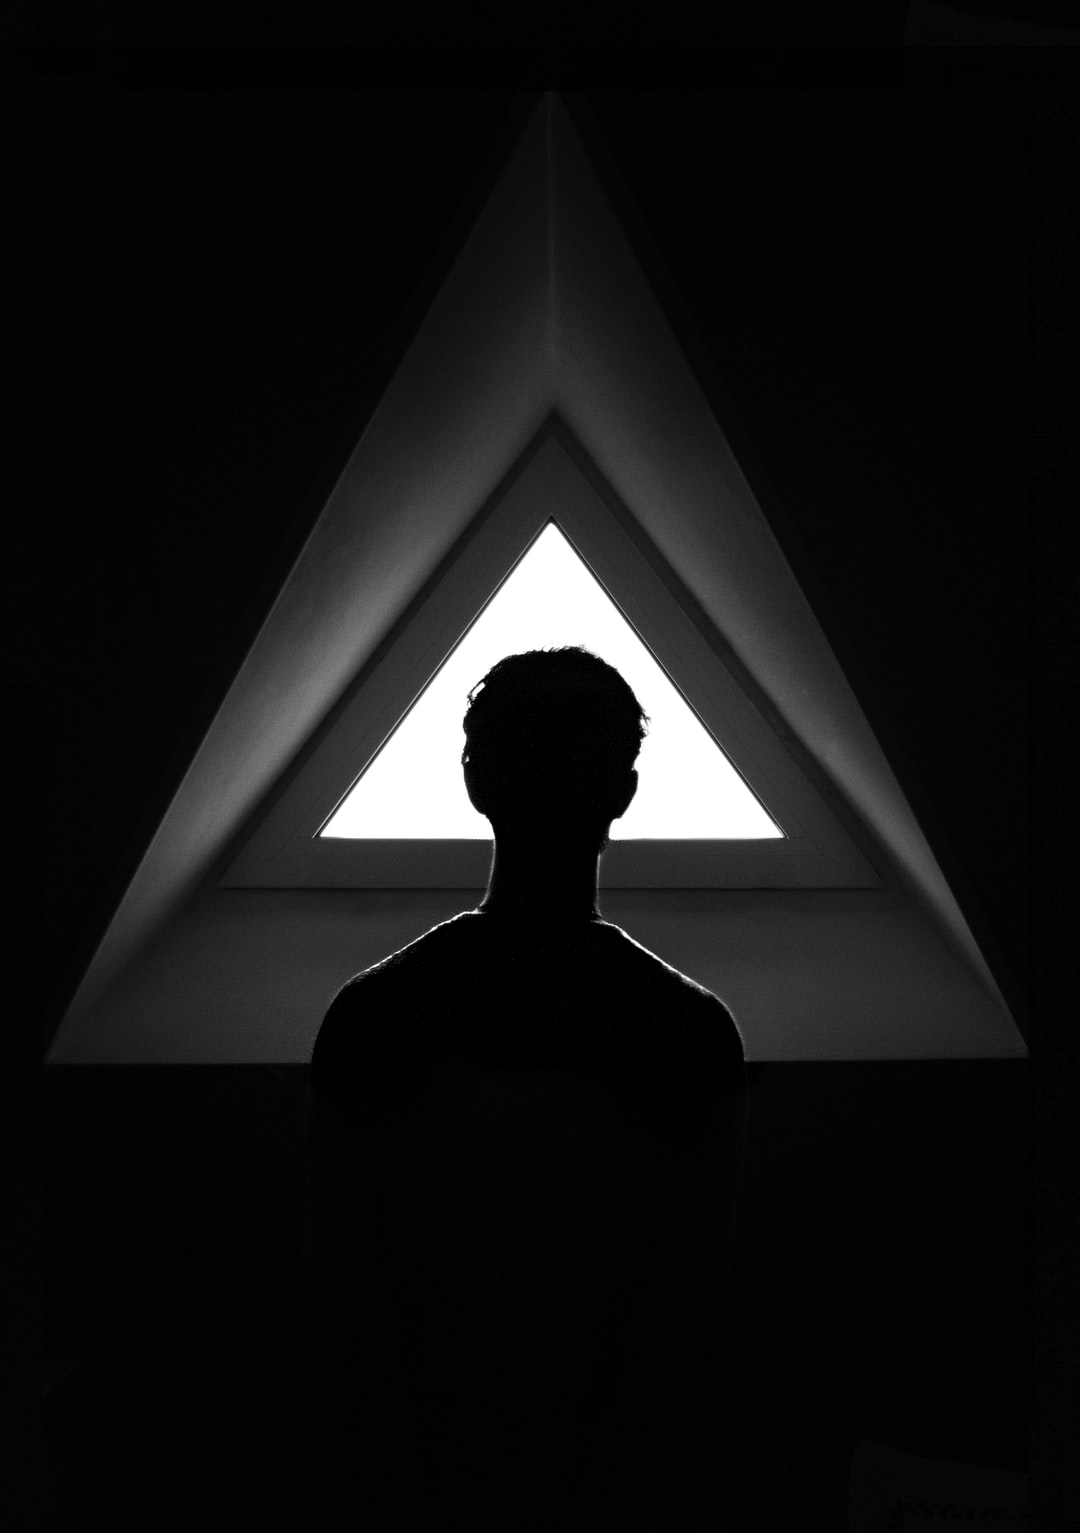 Man looks through triangular window.